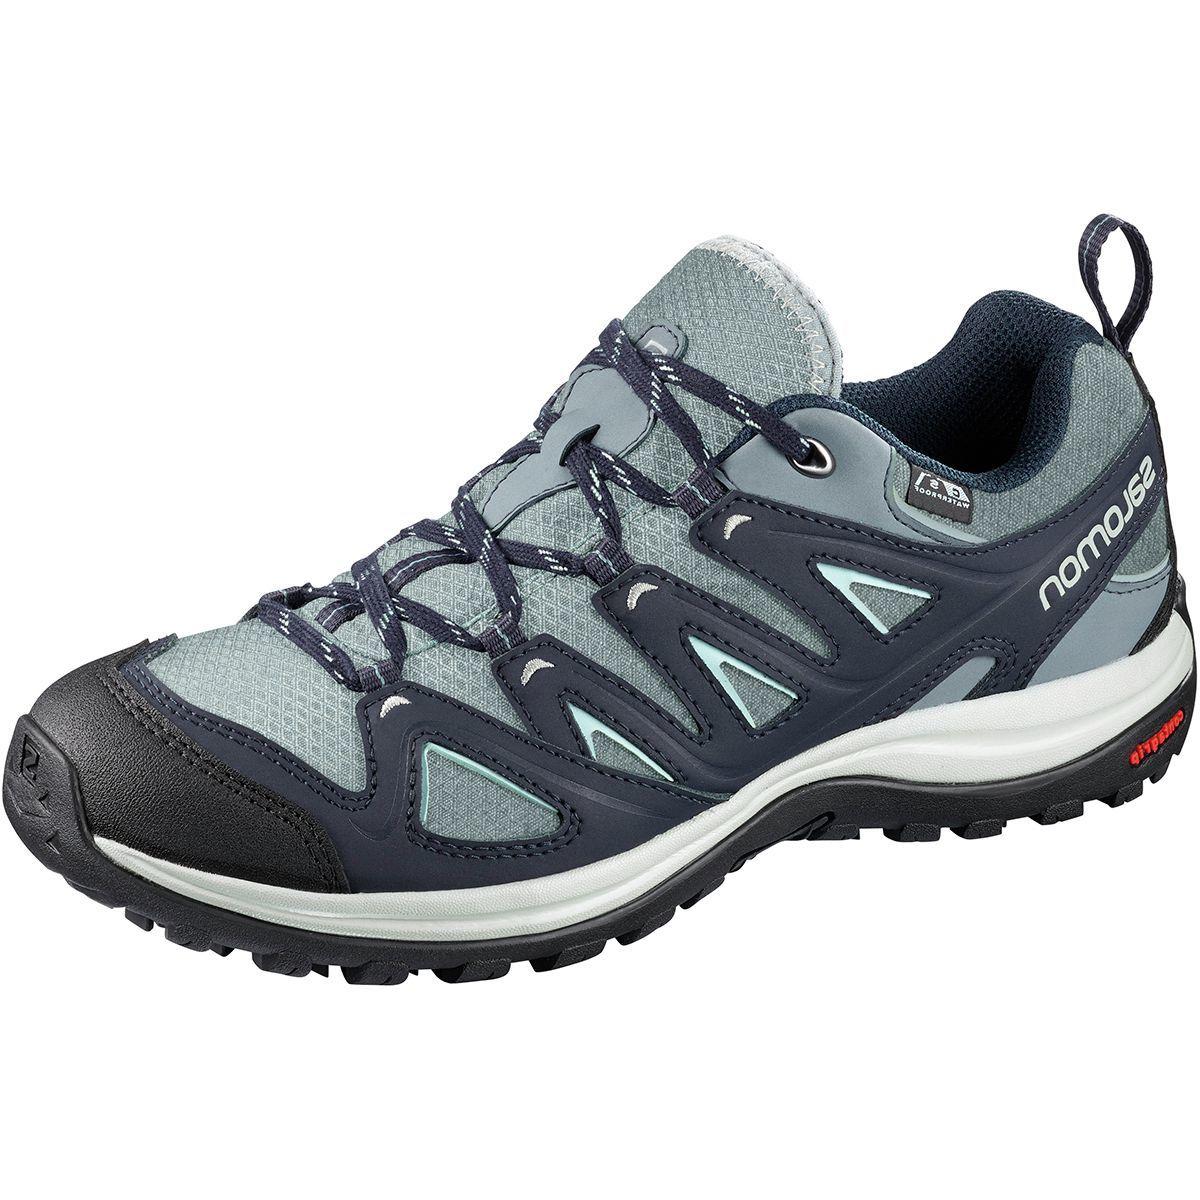 Salomon Ellipse 3 CS WP Hiking Shoe - Women's